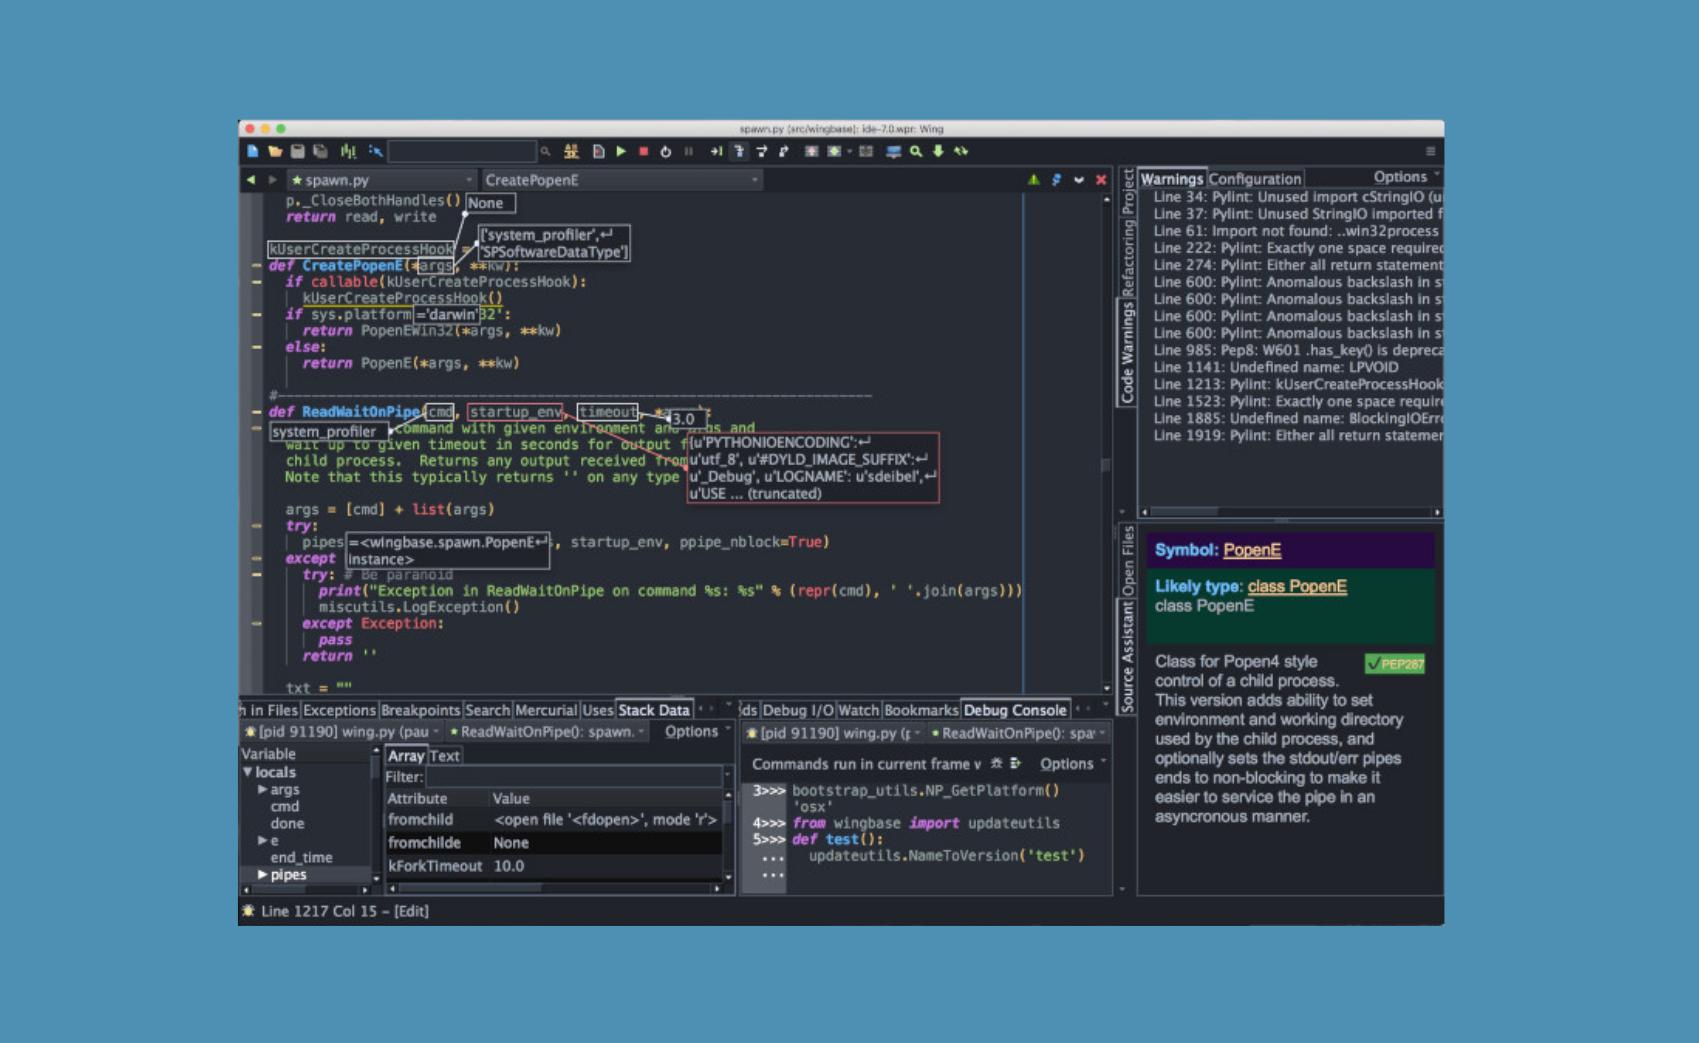 como-instalar-o-wing-pro-7-uma-ide-python-no-ubuntu-linux-mint-fedora-debian